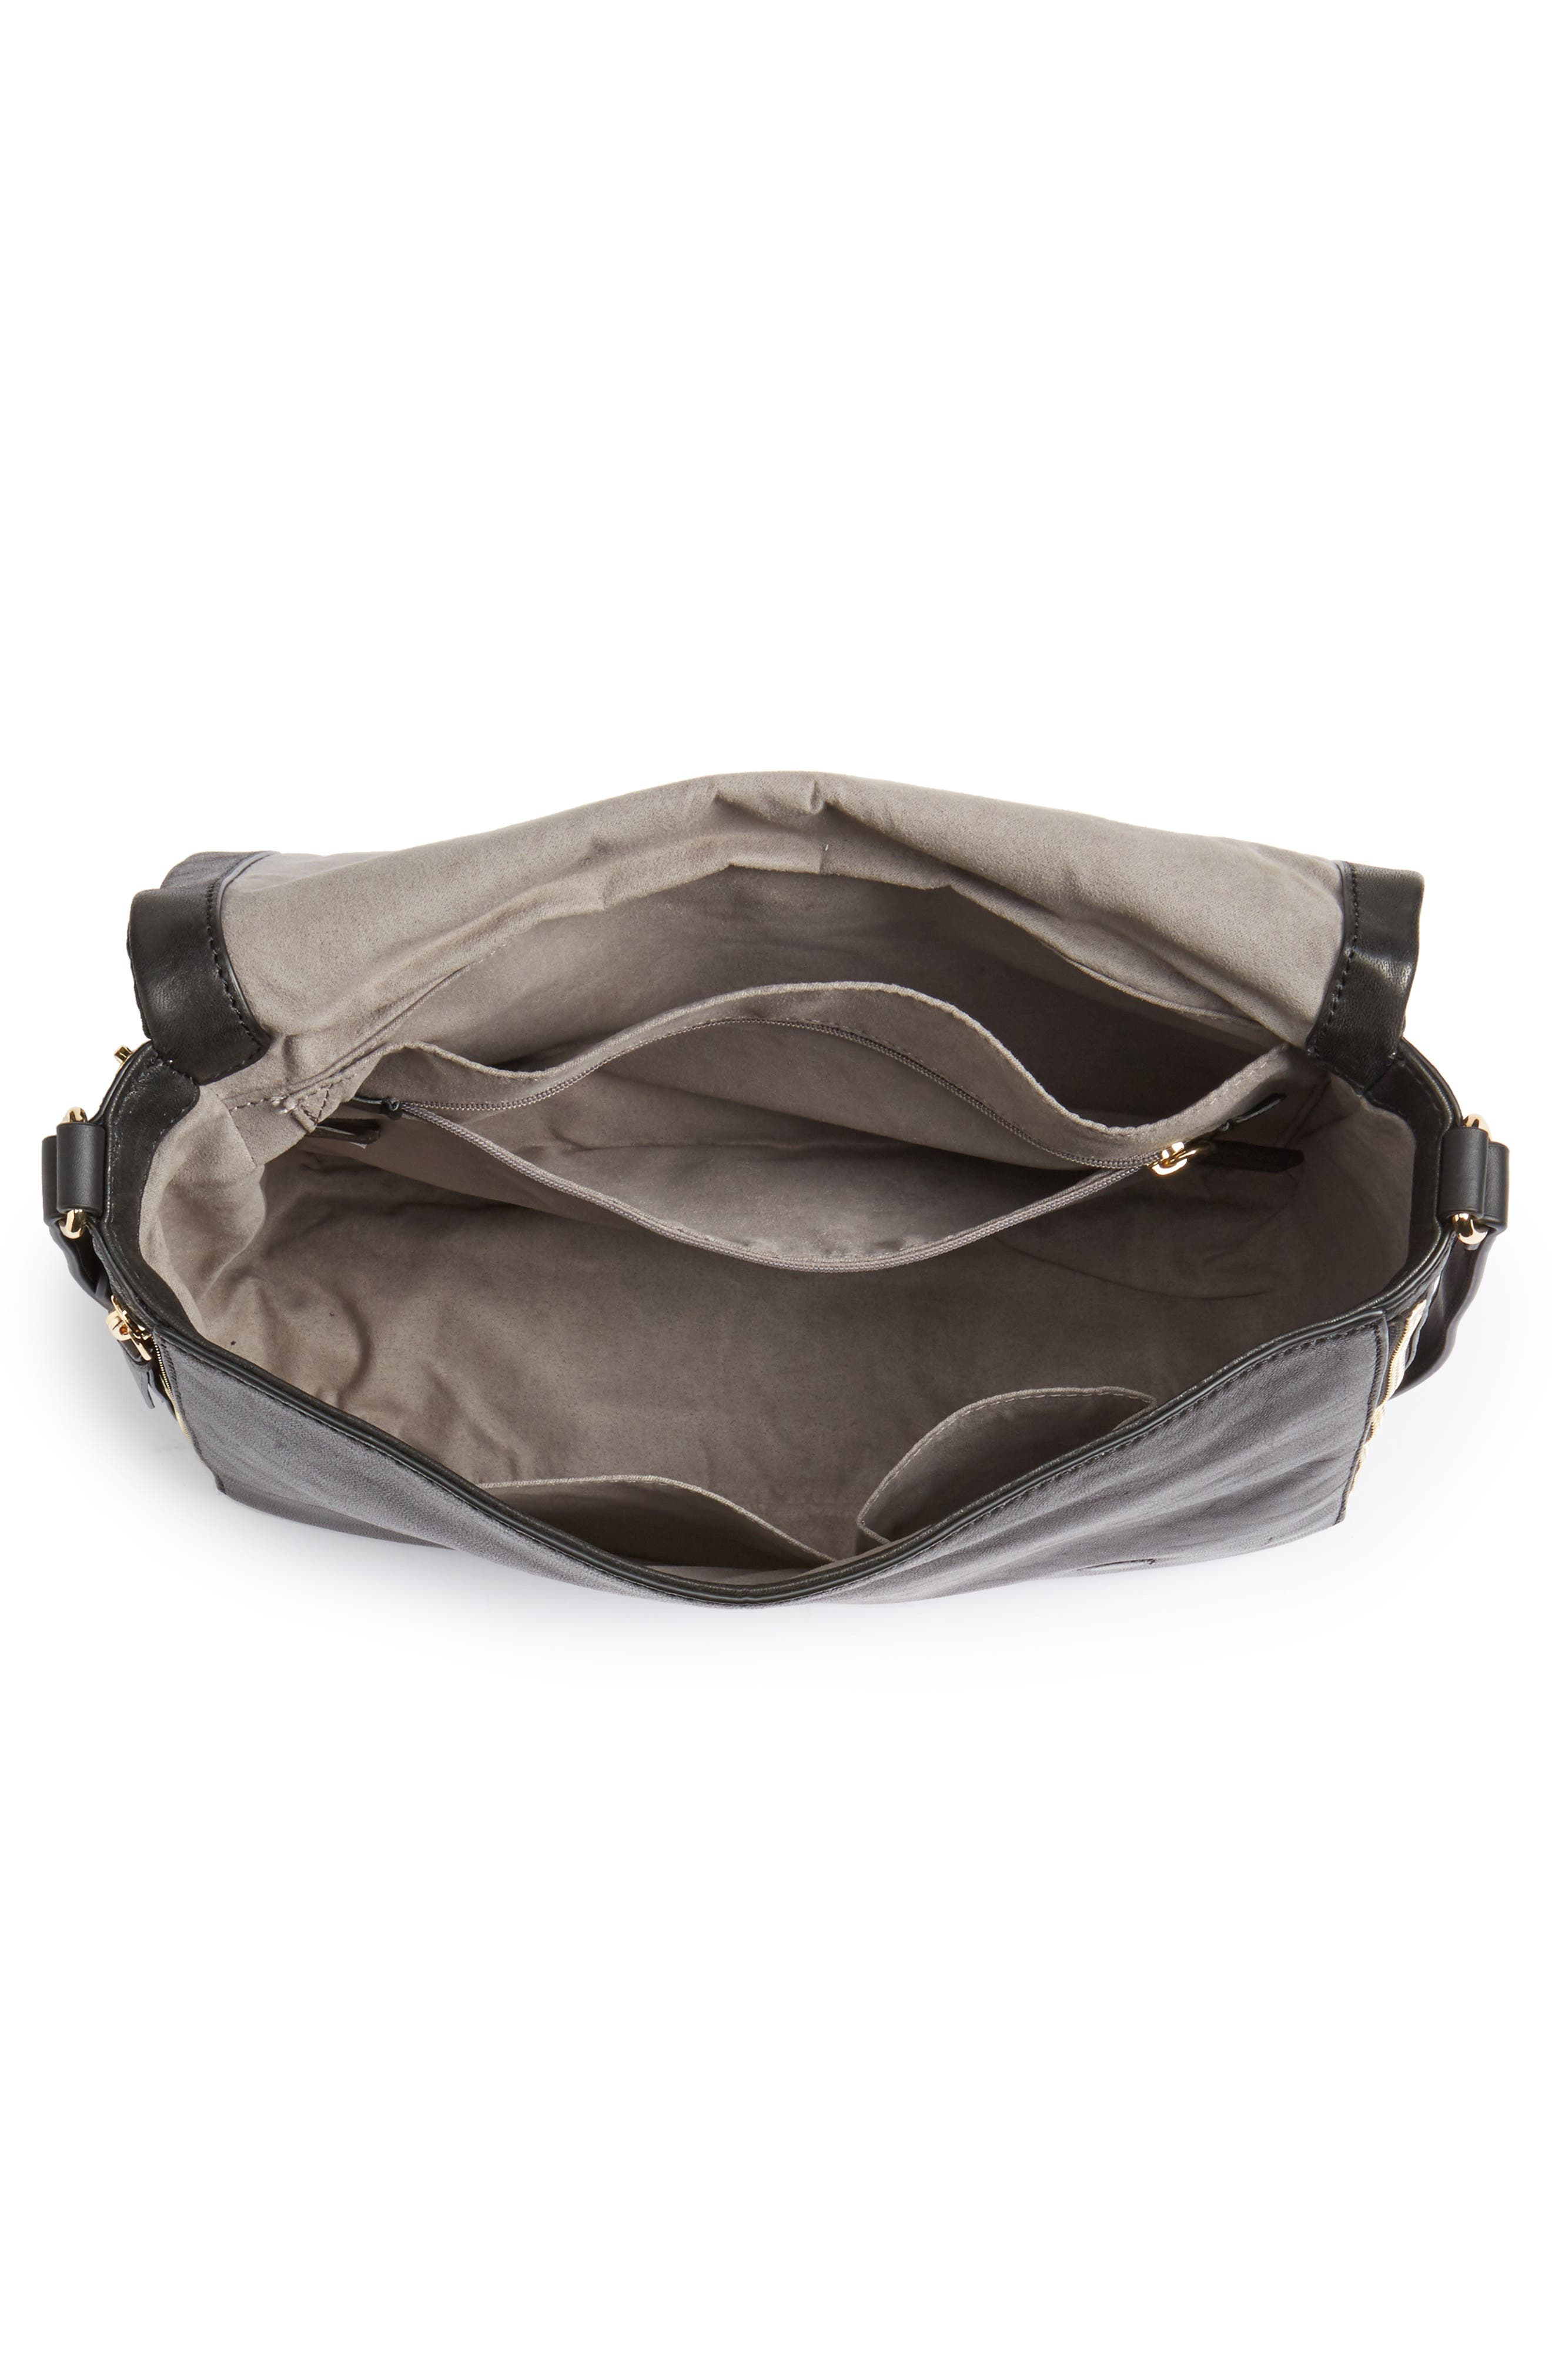 Delos Leather Messenger Bag,                             Alternate thumbnail 4, color,                             002